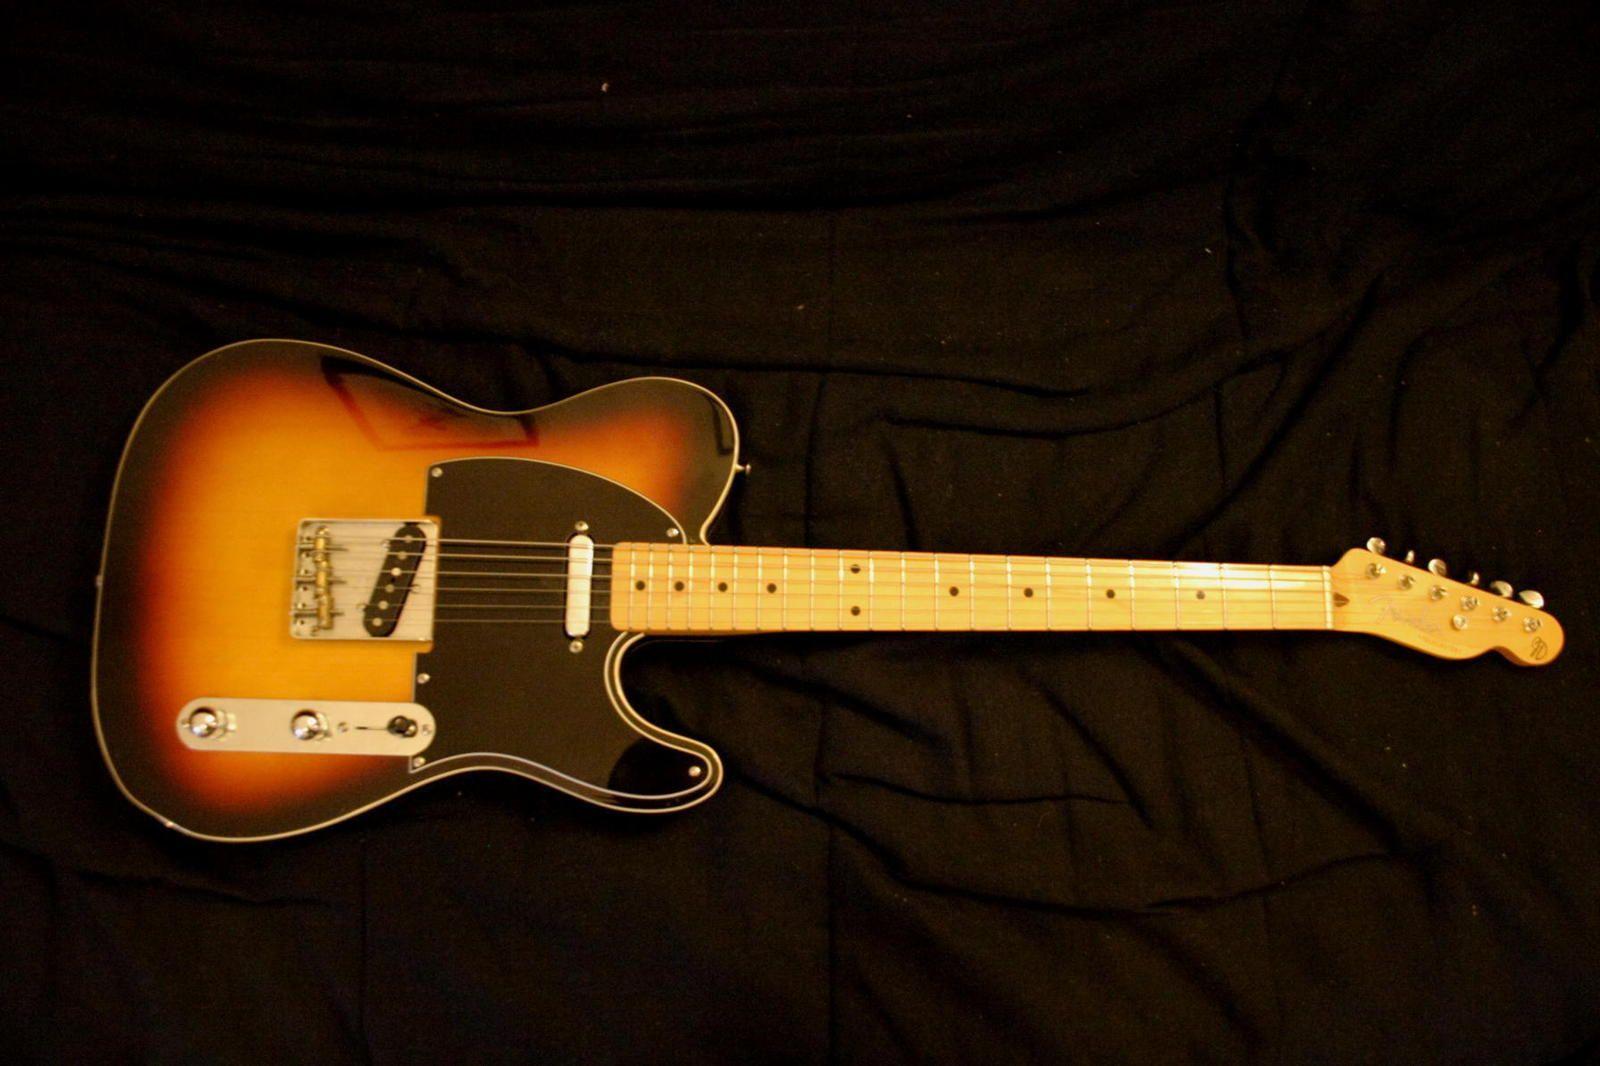 3000x989px 803035 Fender Telecaster 36063 KB 3105 1600x1066